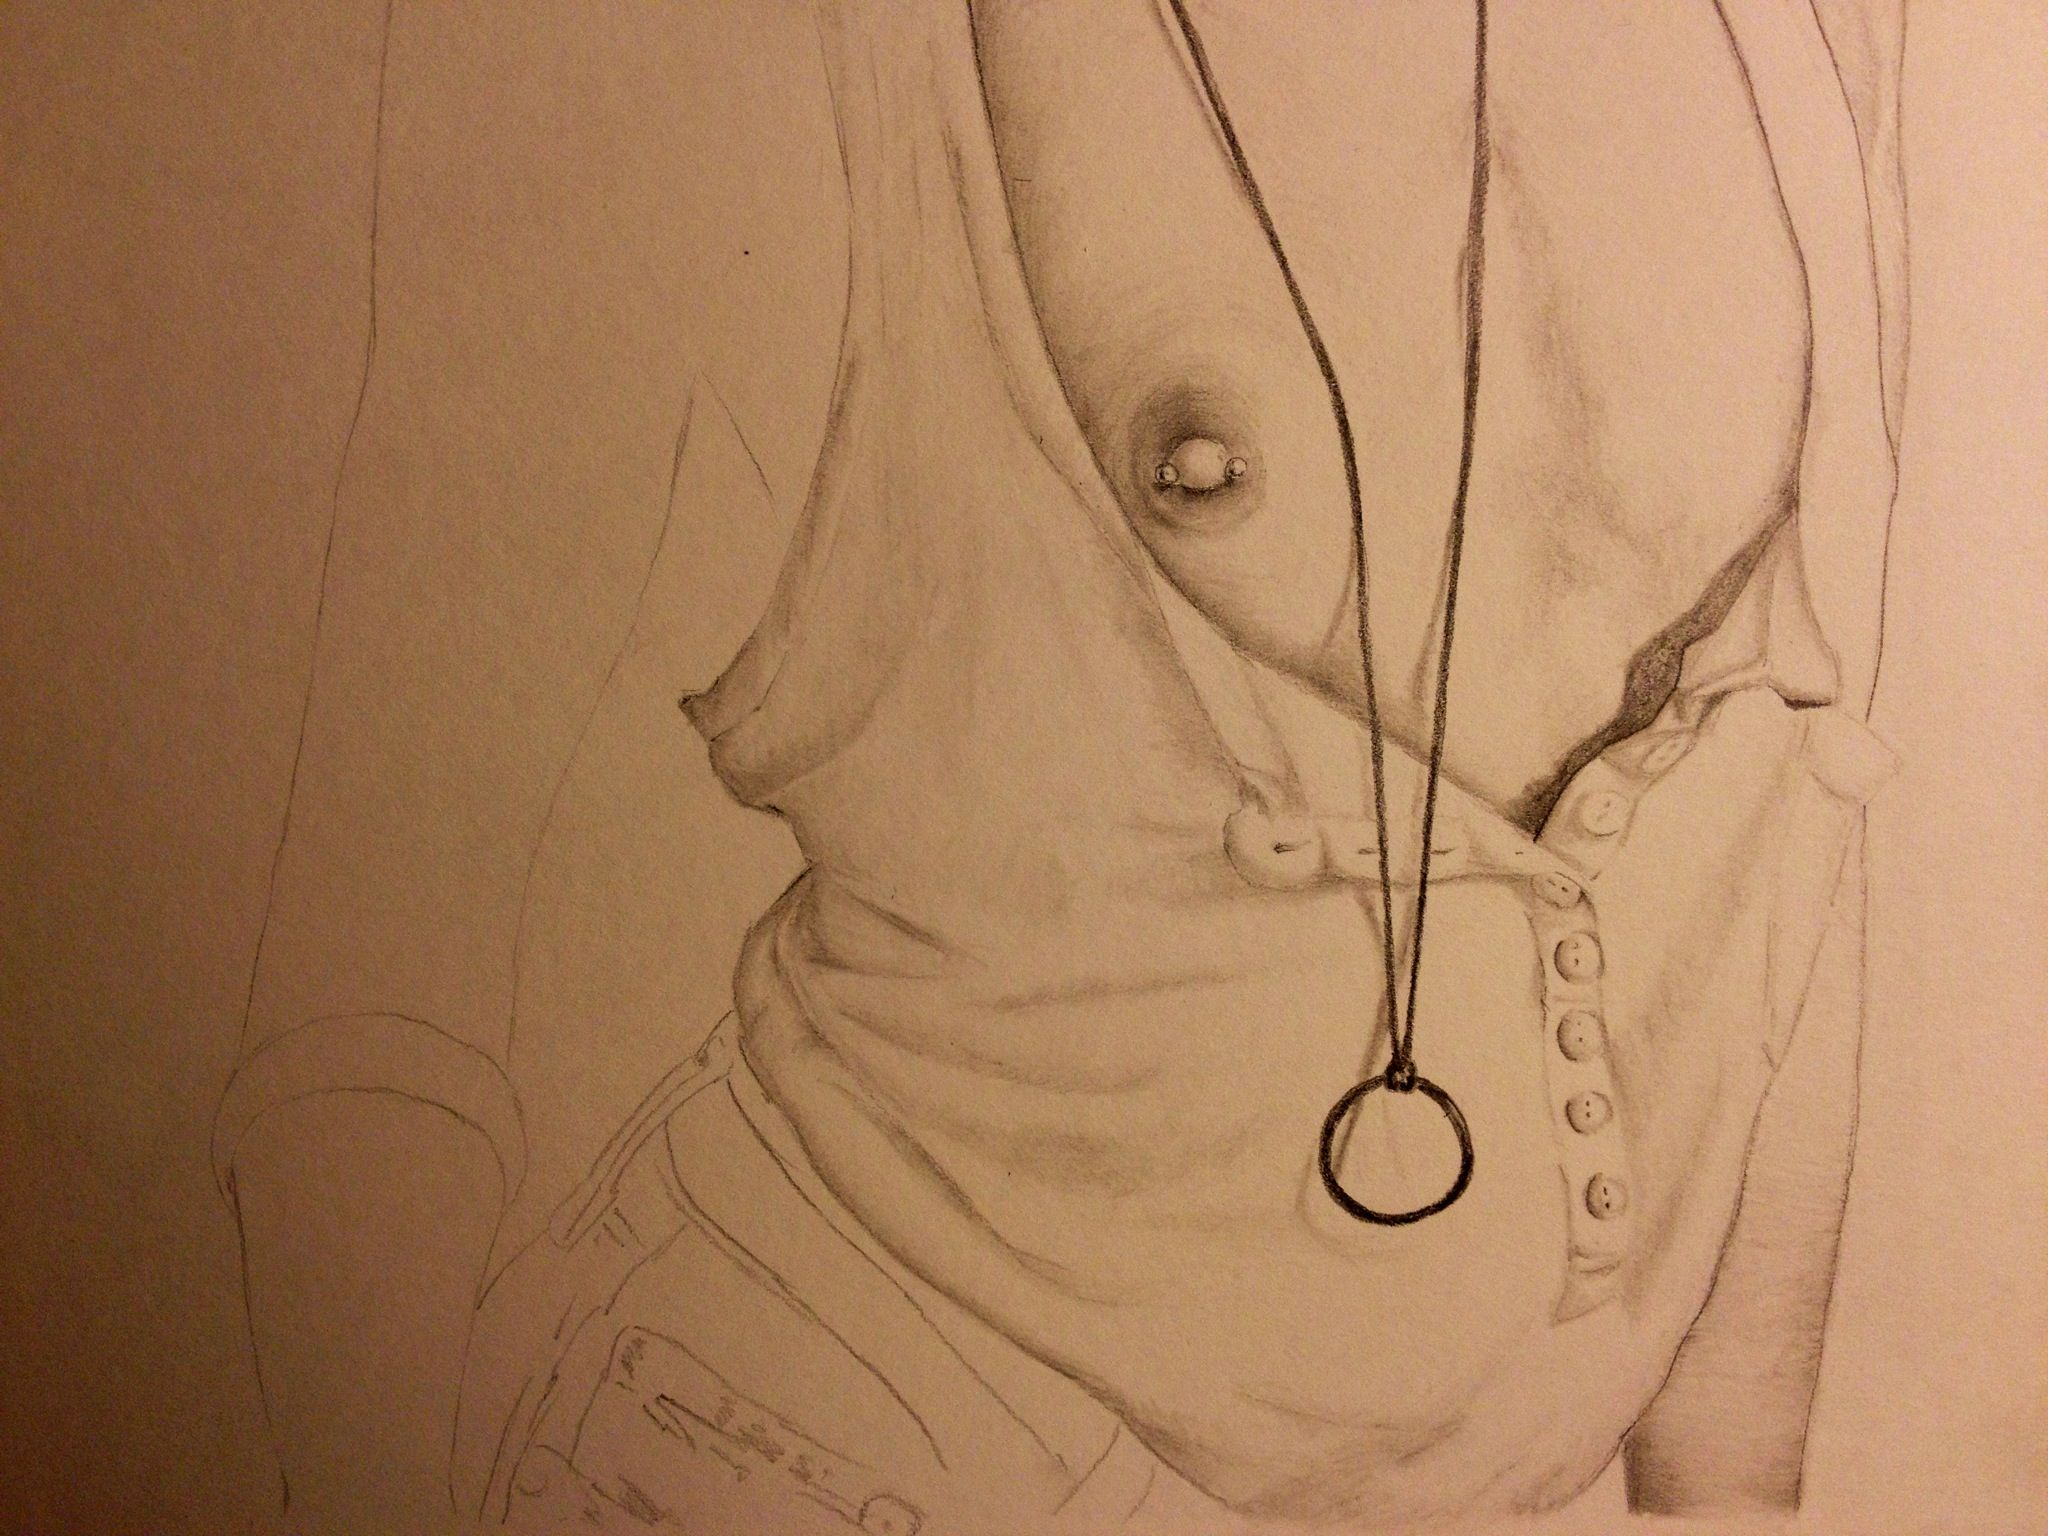 Sorry, Nude art on nippal